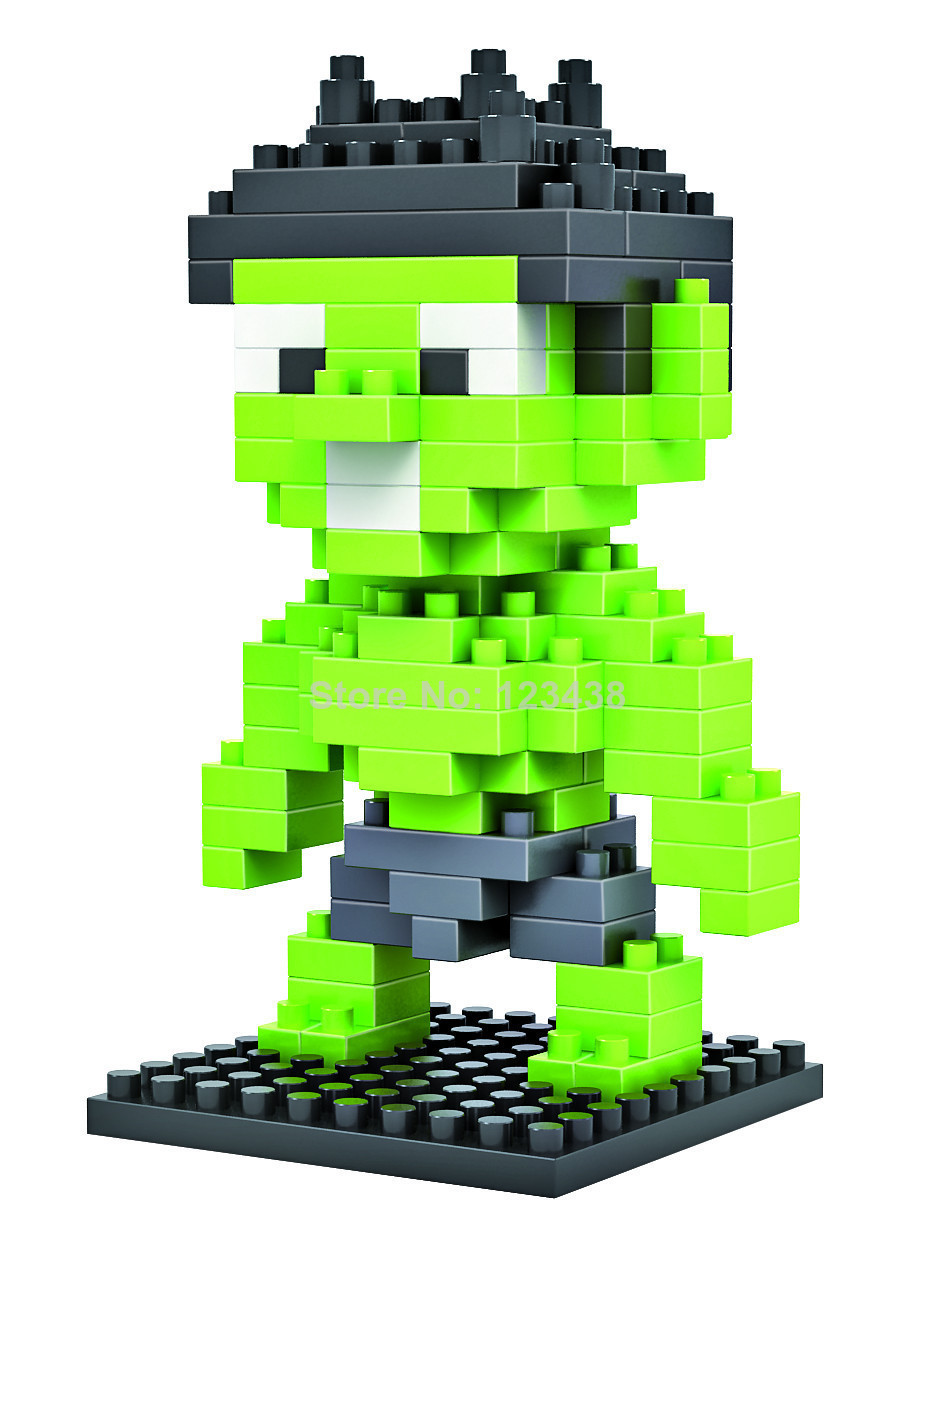 2015 Real Wooden Toys Montessori Brinquedos Hulk & Ironman Loz Diamond Blocks Toy Building Sets Educational Bricks - I love baby store